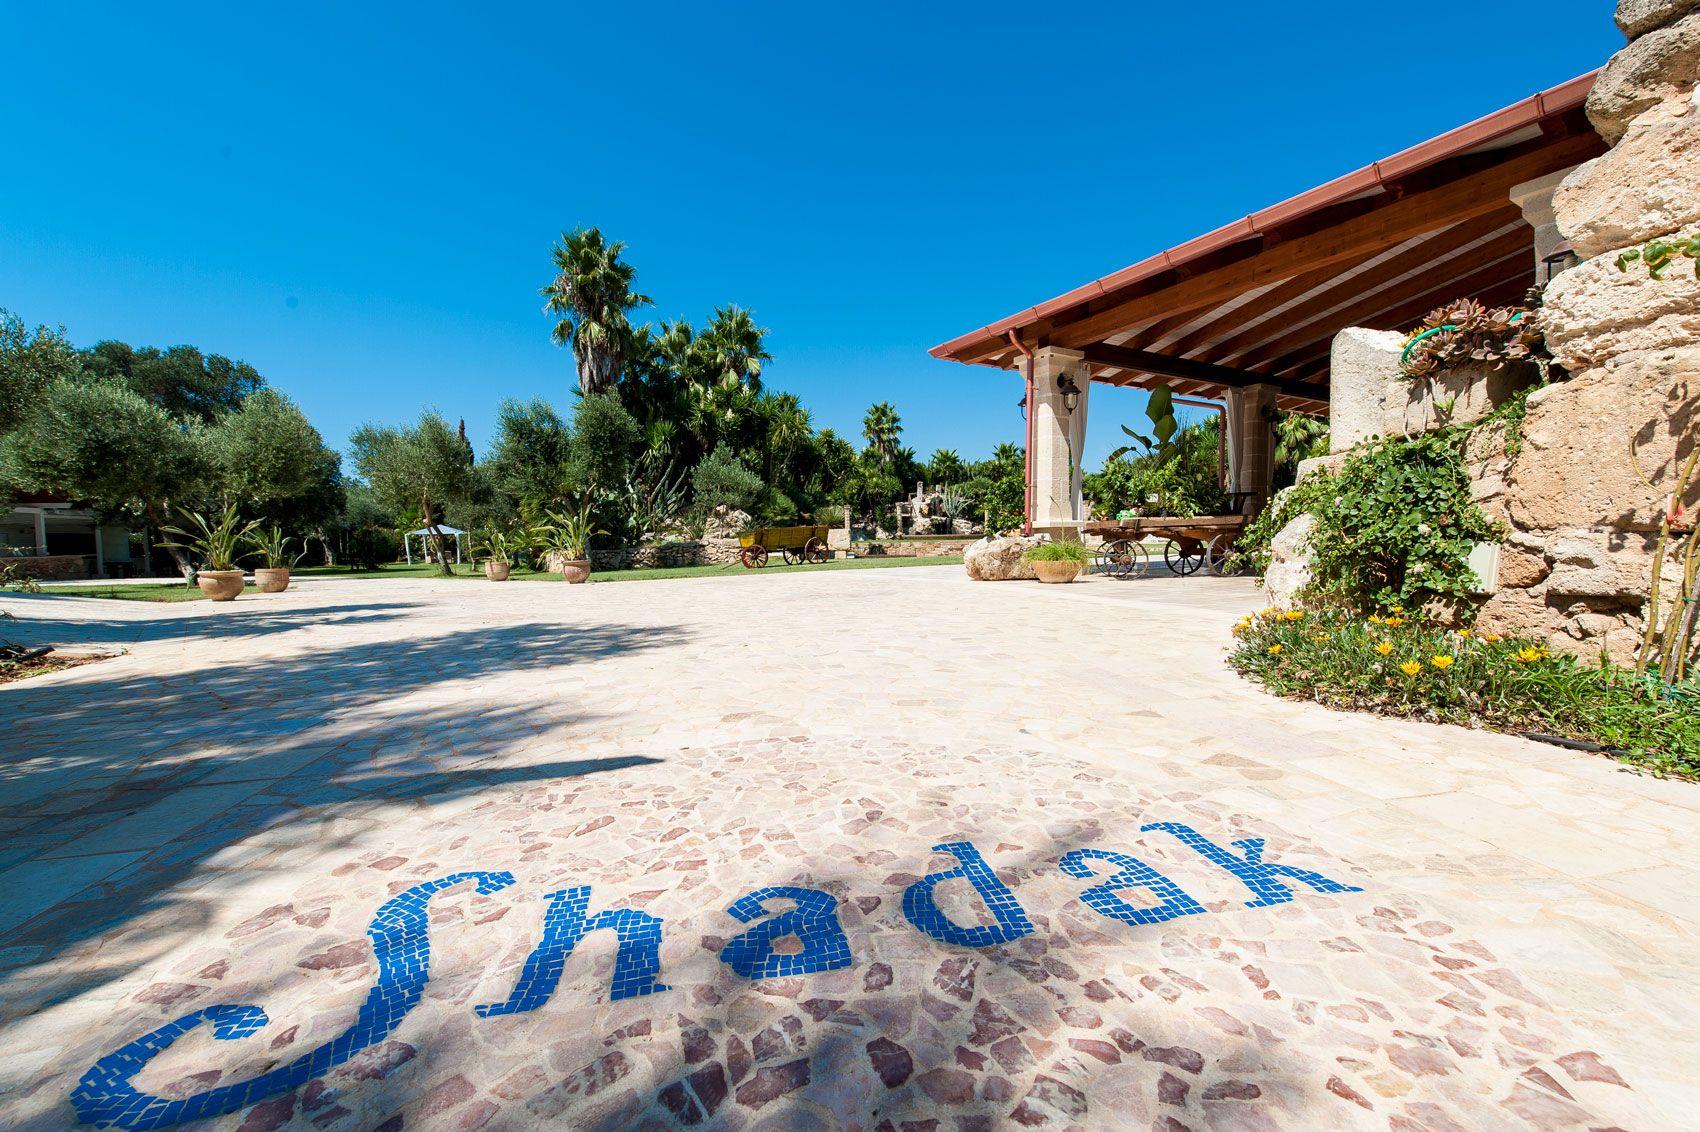 Villaggio Camping Park Shadak